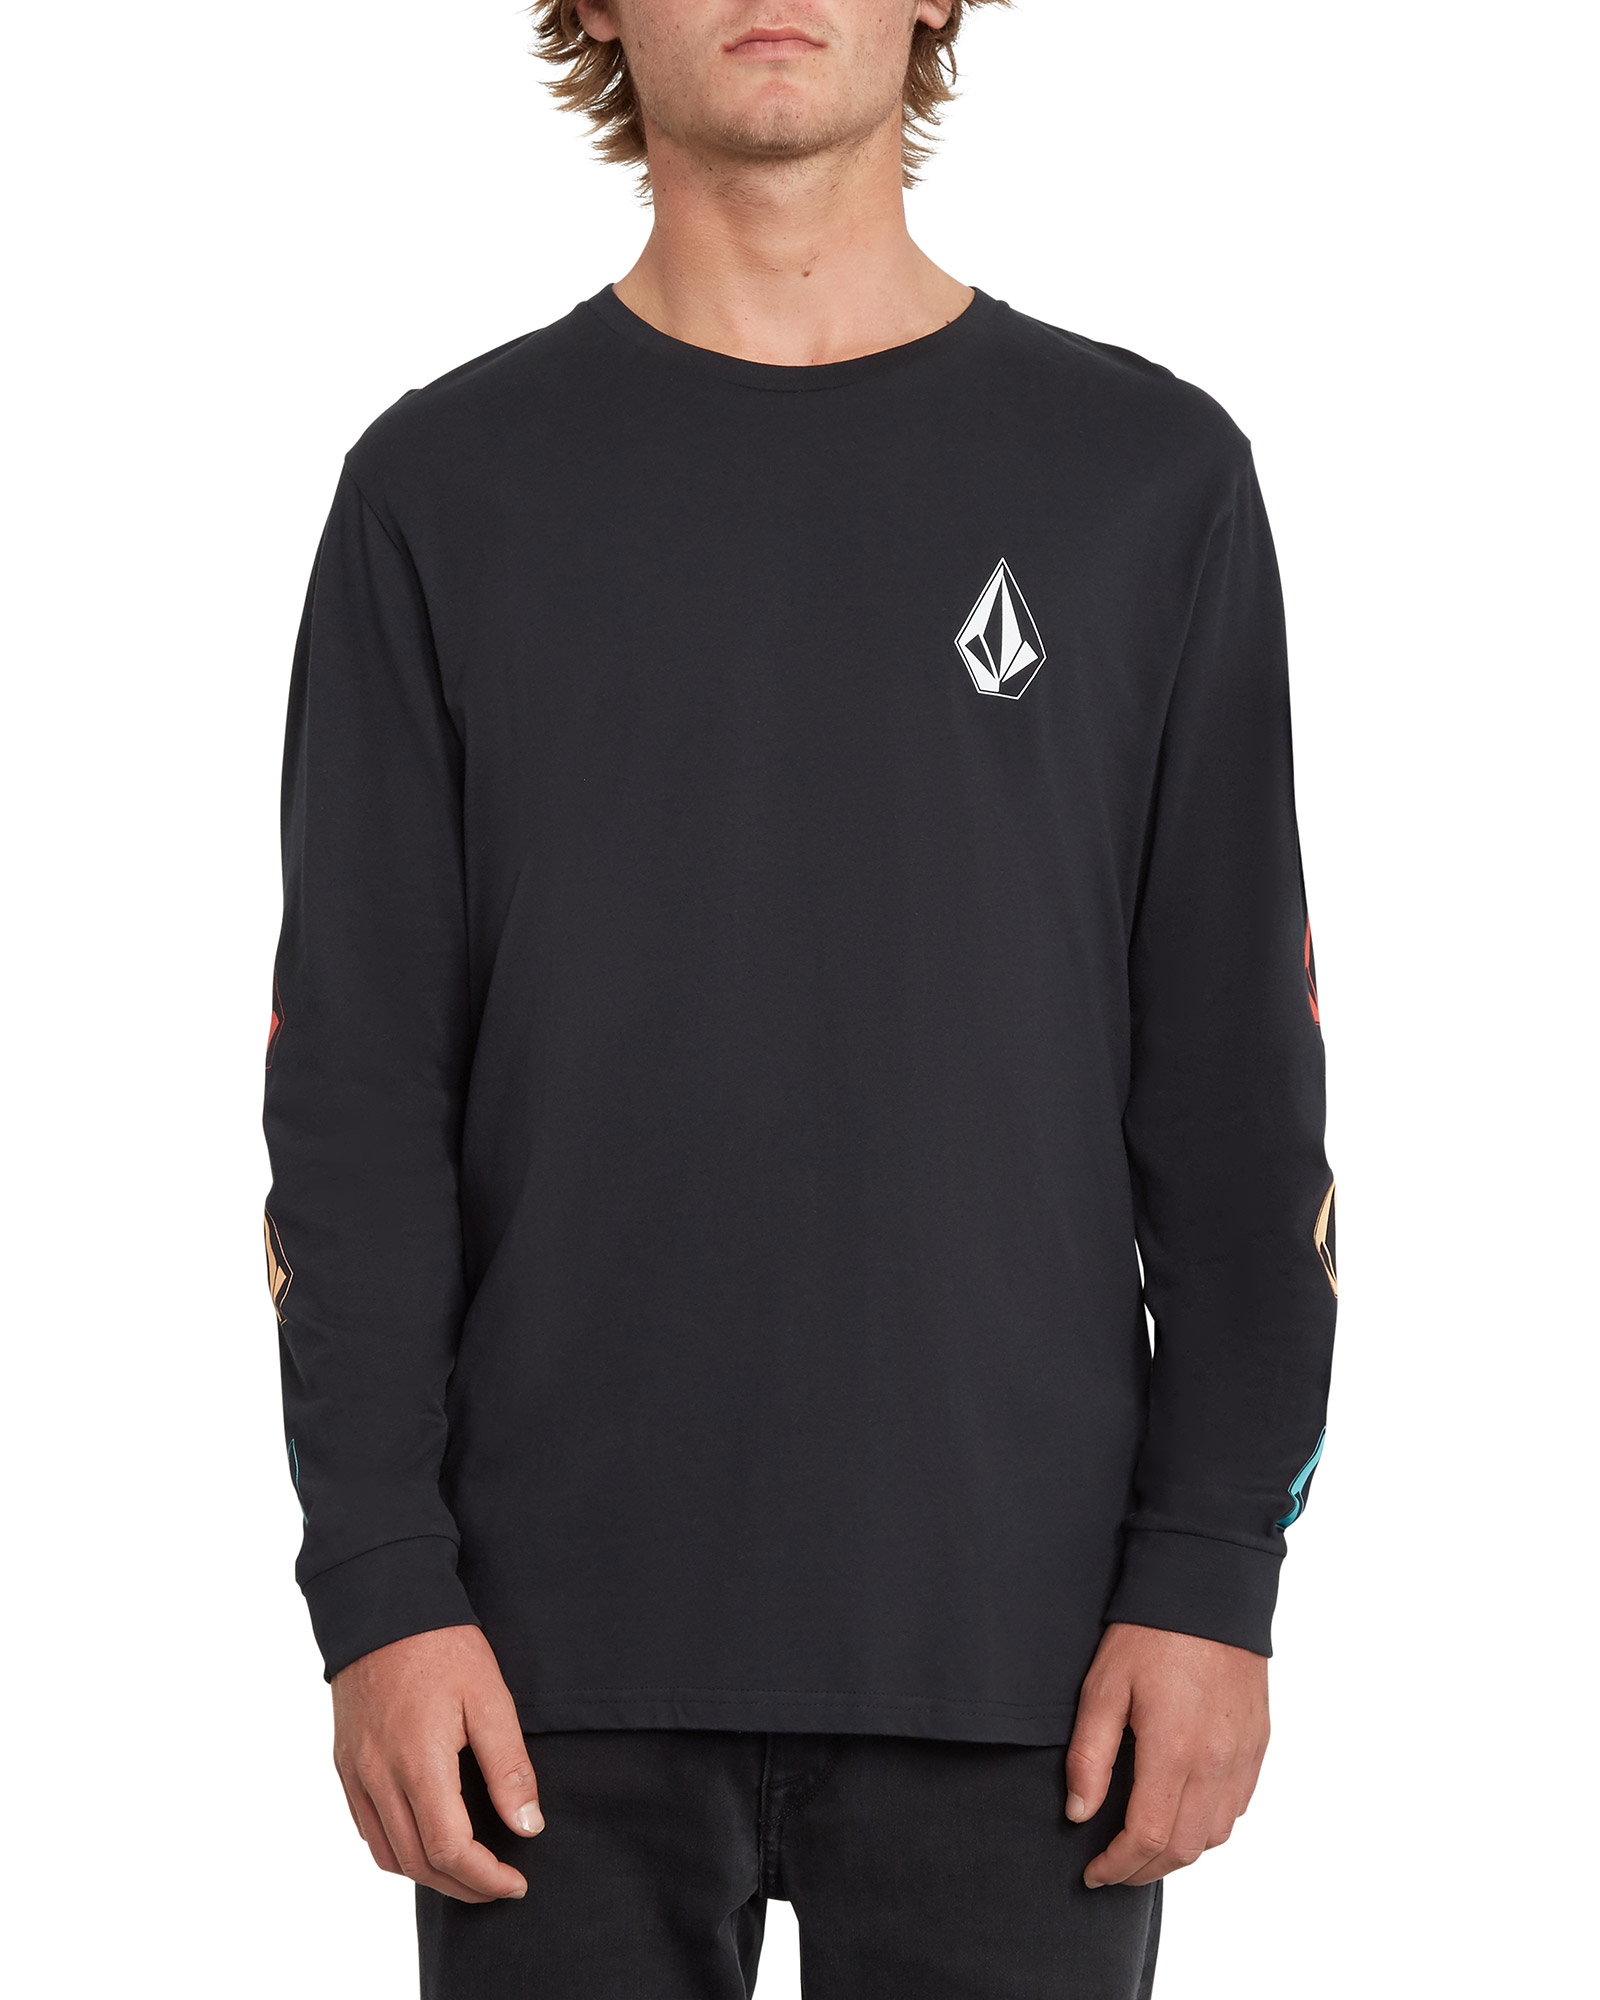 Volcom Men's Deadly Stone BSC Long Sleeve T-Shirt 0